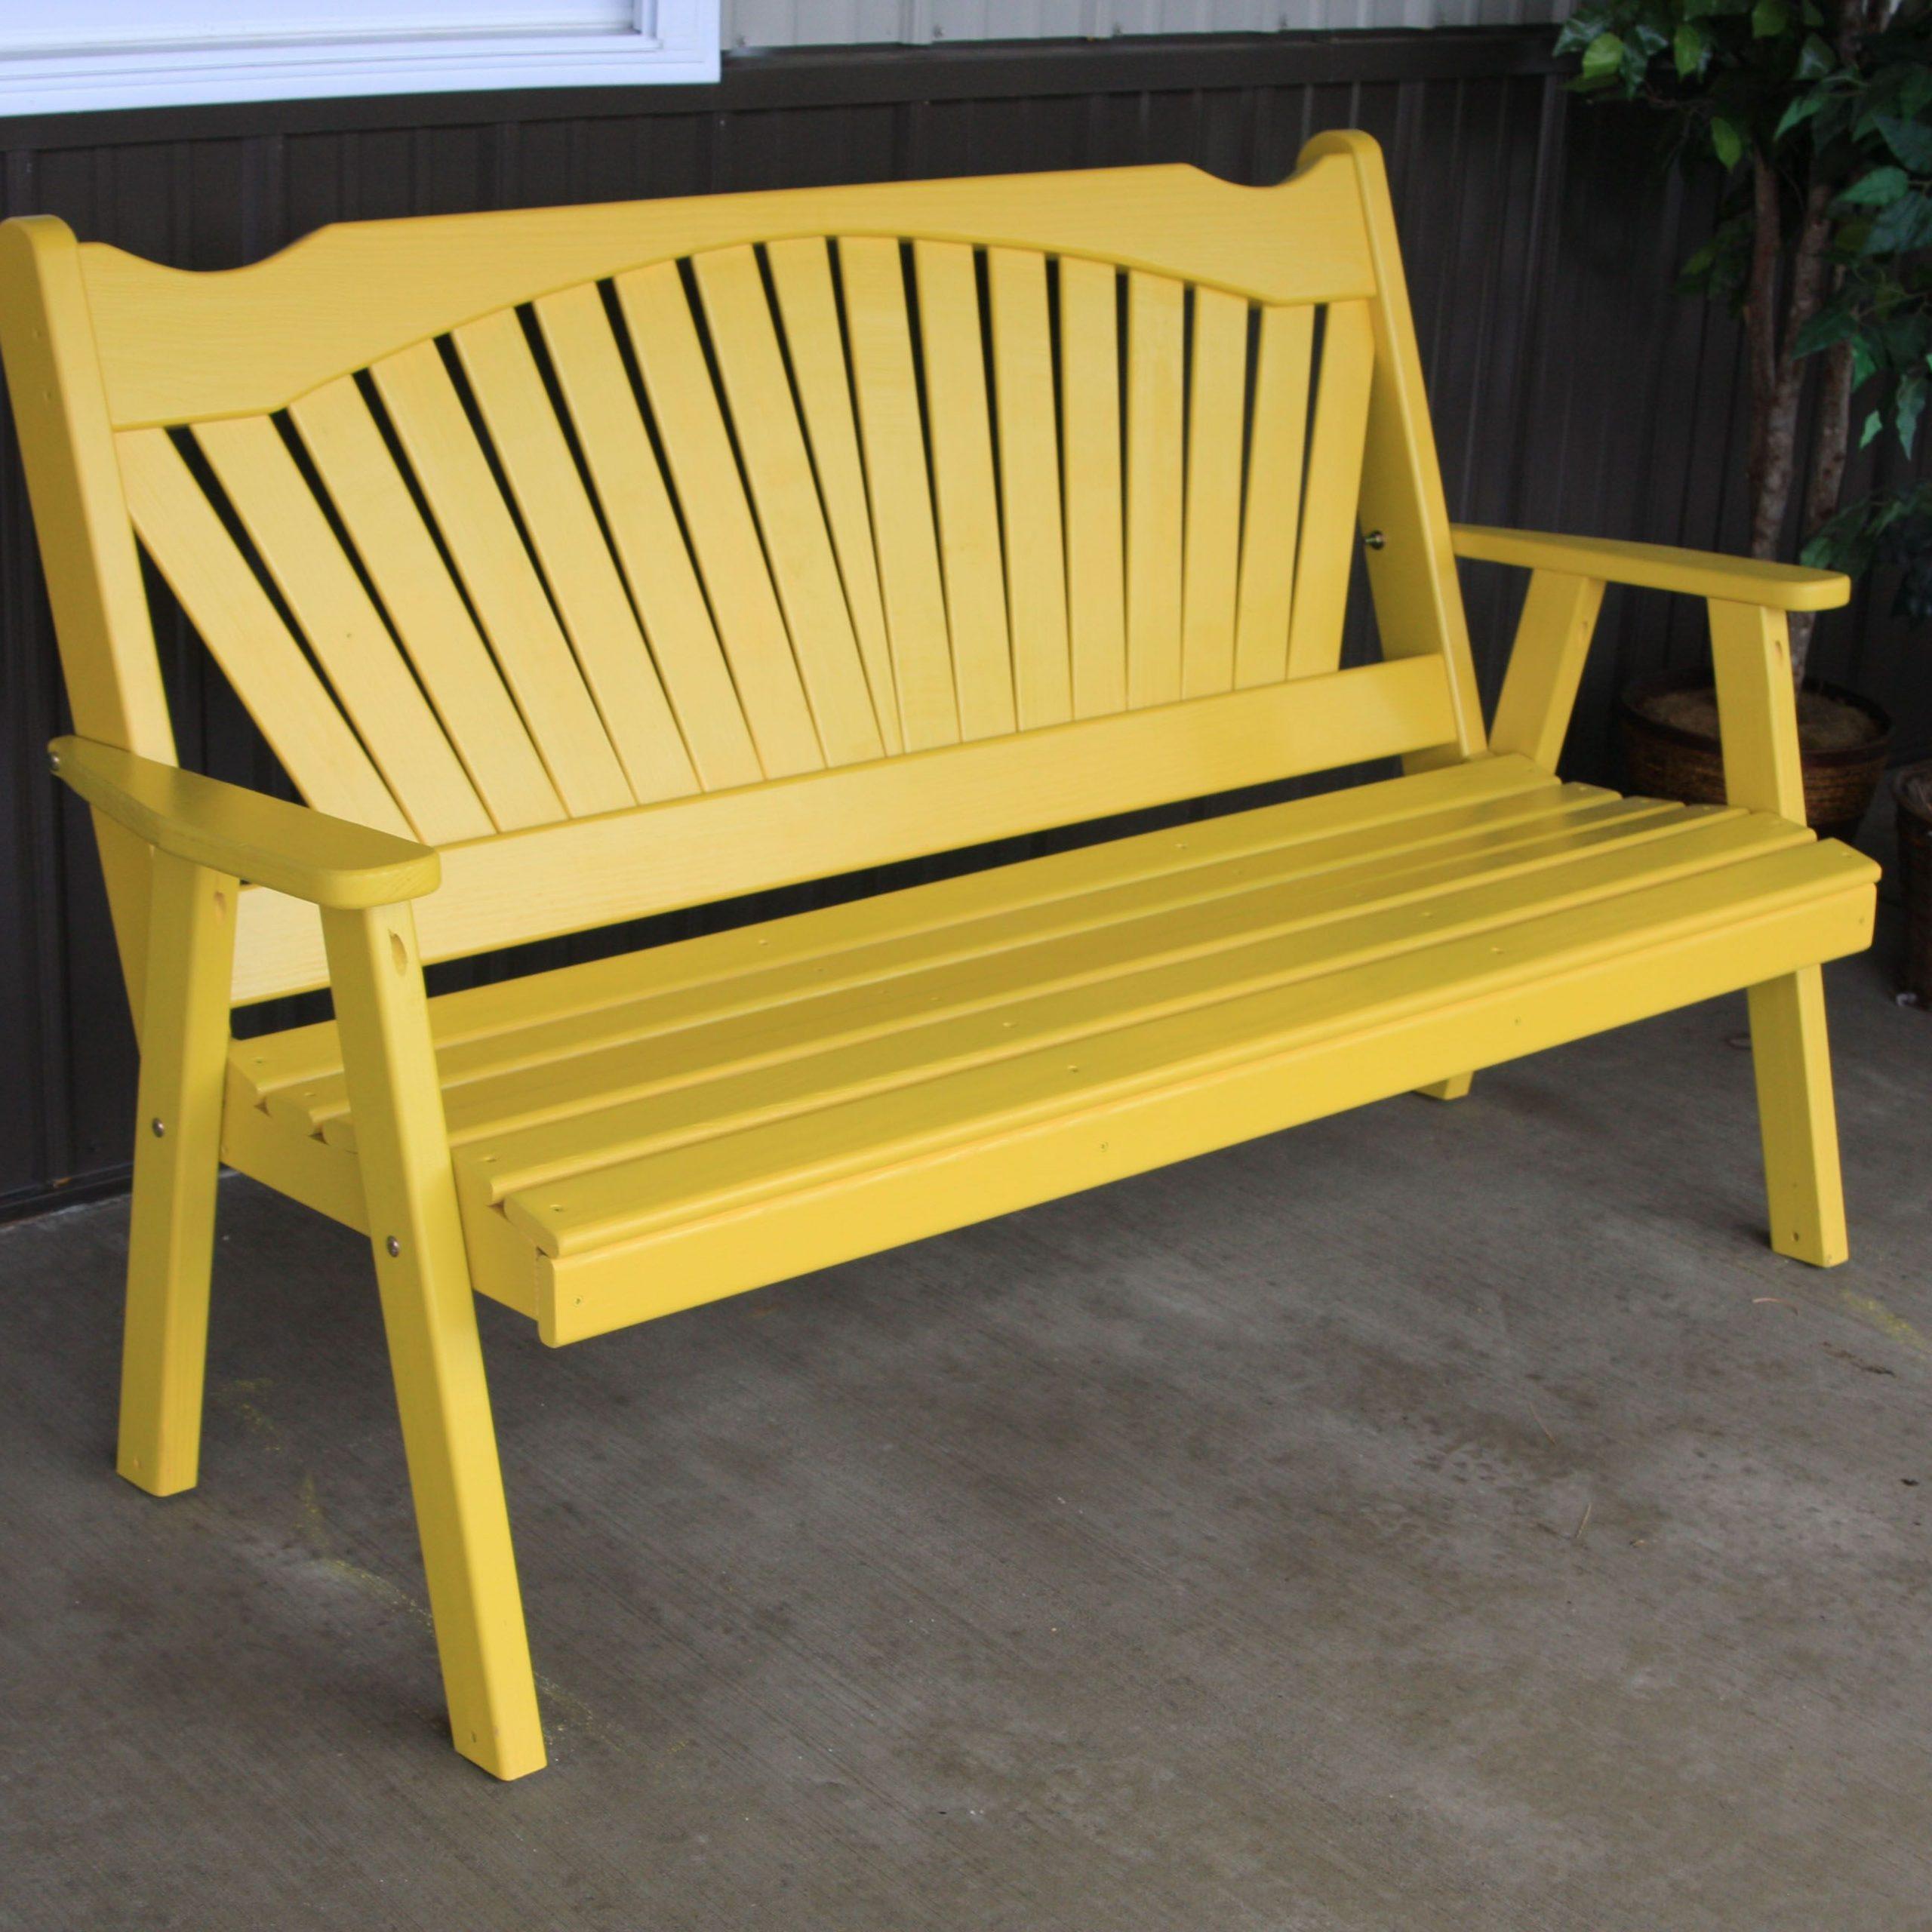 Pine 5' Fanback Bench  A&L   Garden Bench, Outdoor Deck With Regard To Skoog Chevron Wooden Garden Benches (View 9 of 25)